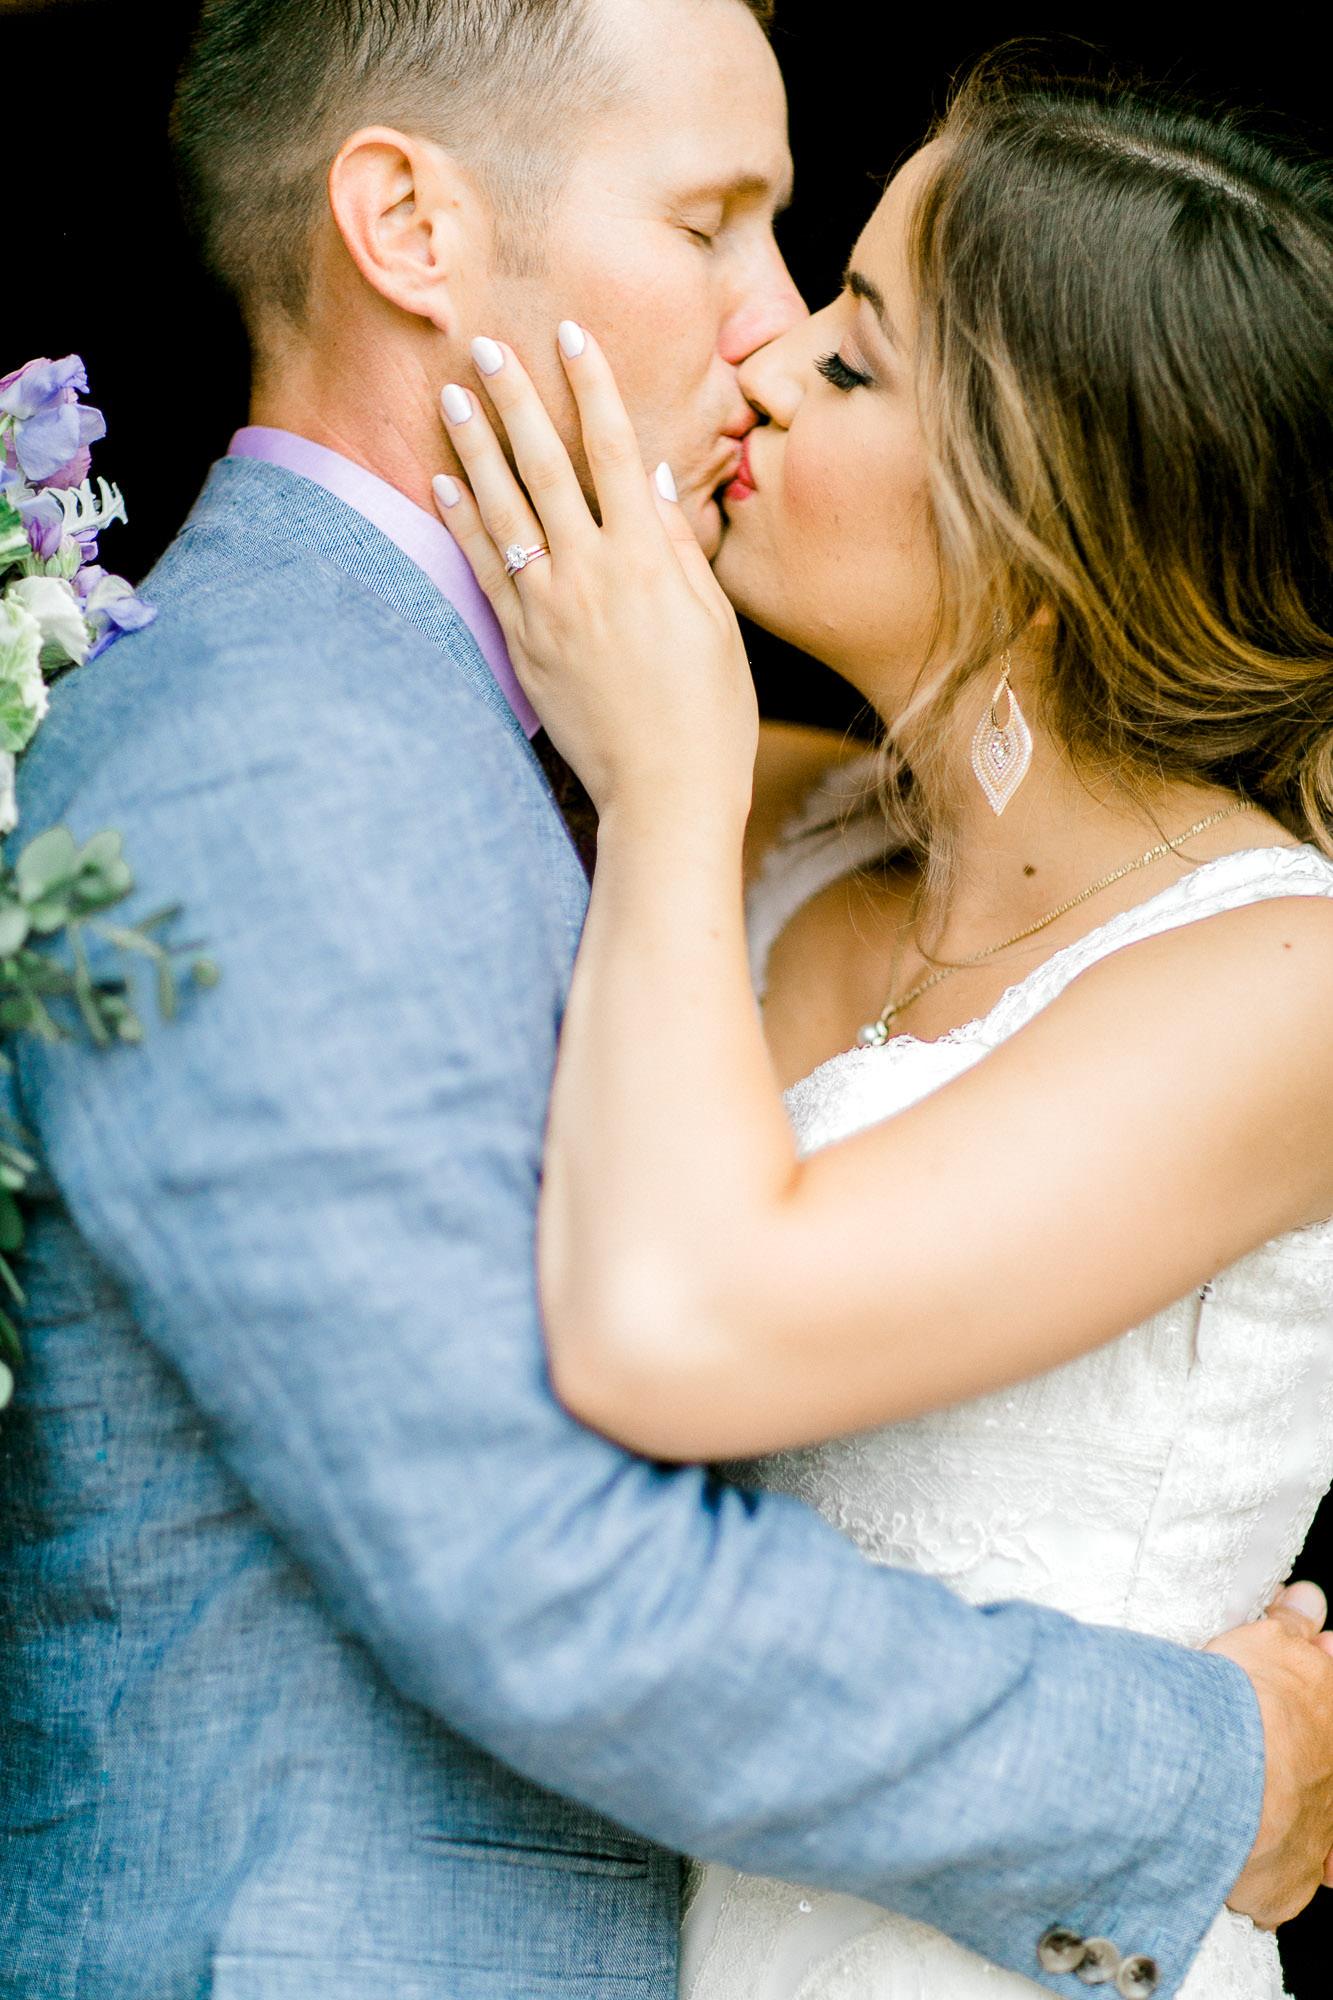 alexis-joel-laury-lubbock-weddingphotographer-alleej0032.jpg